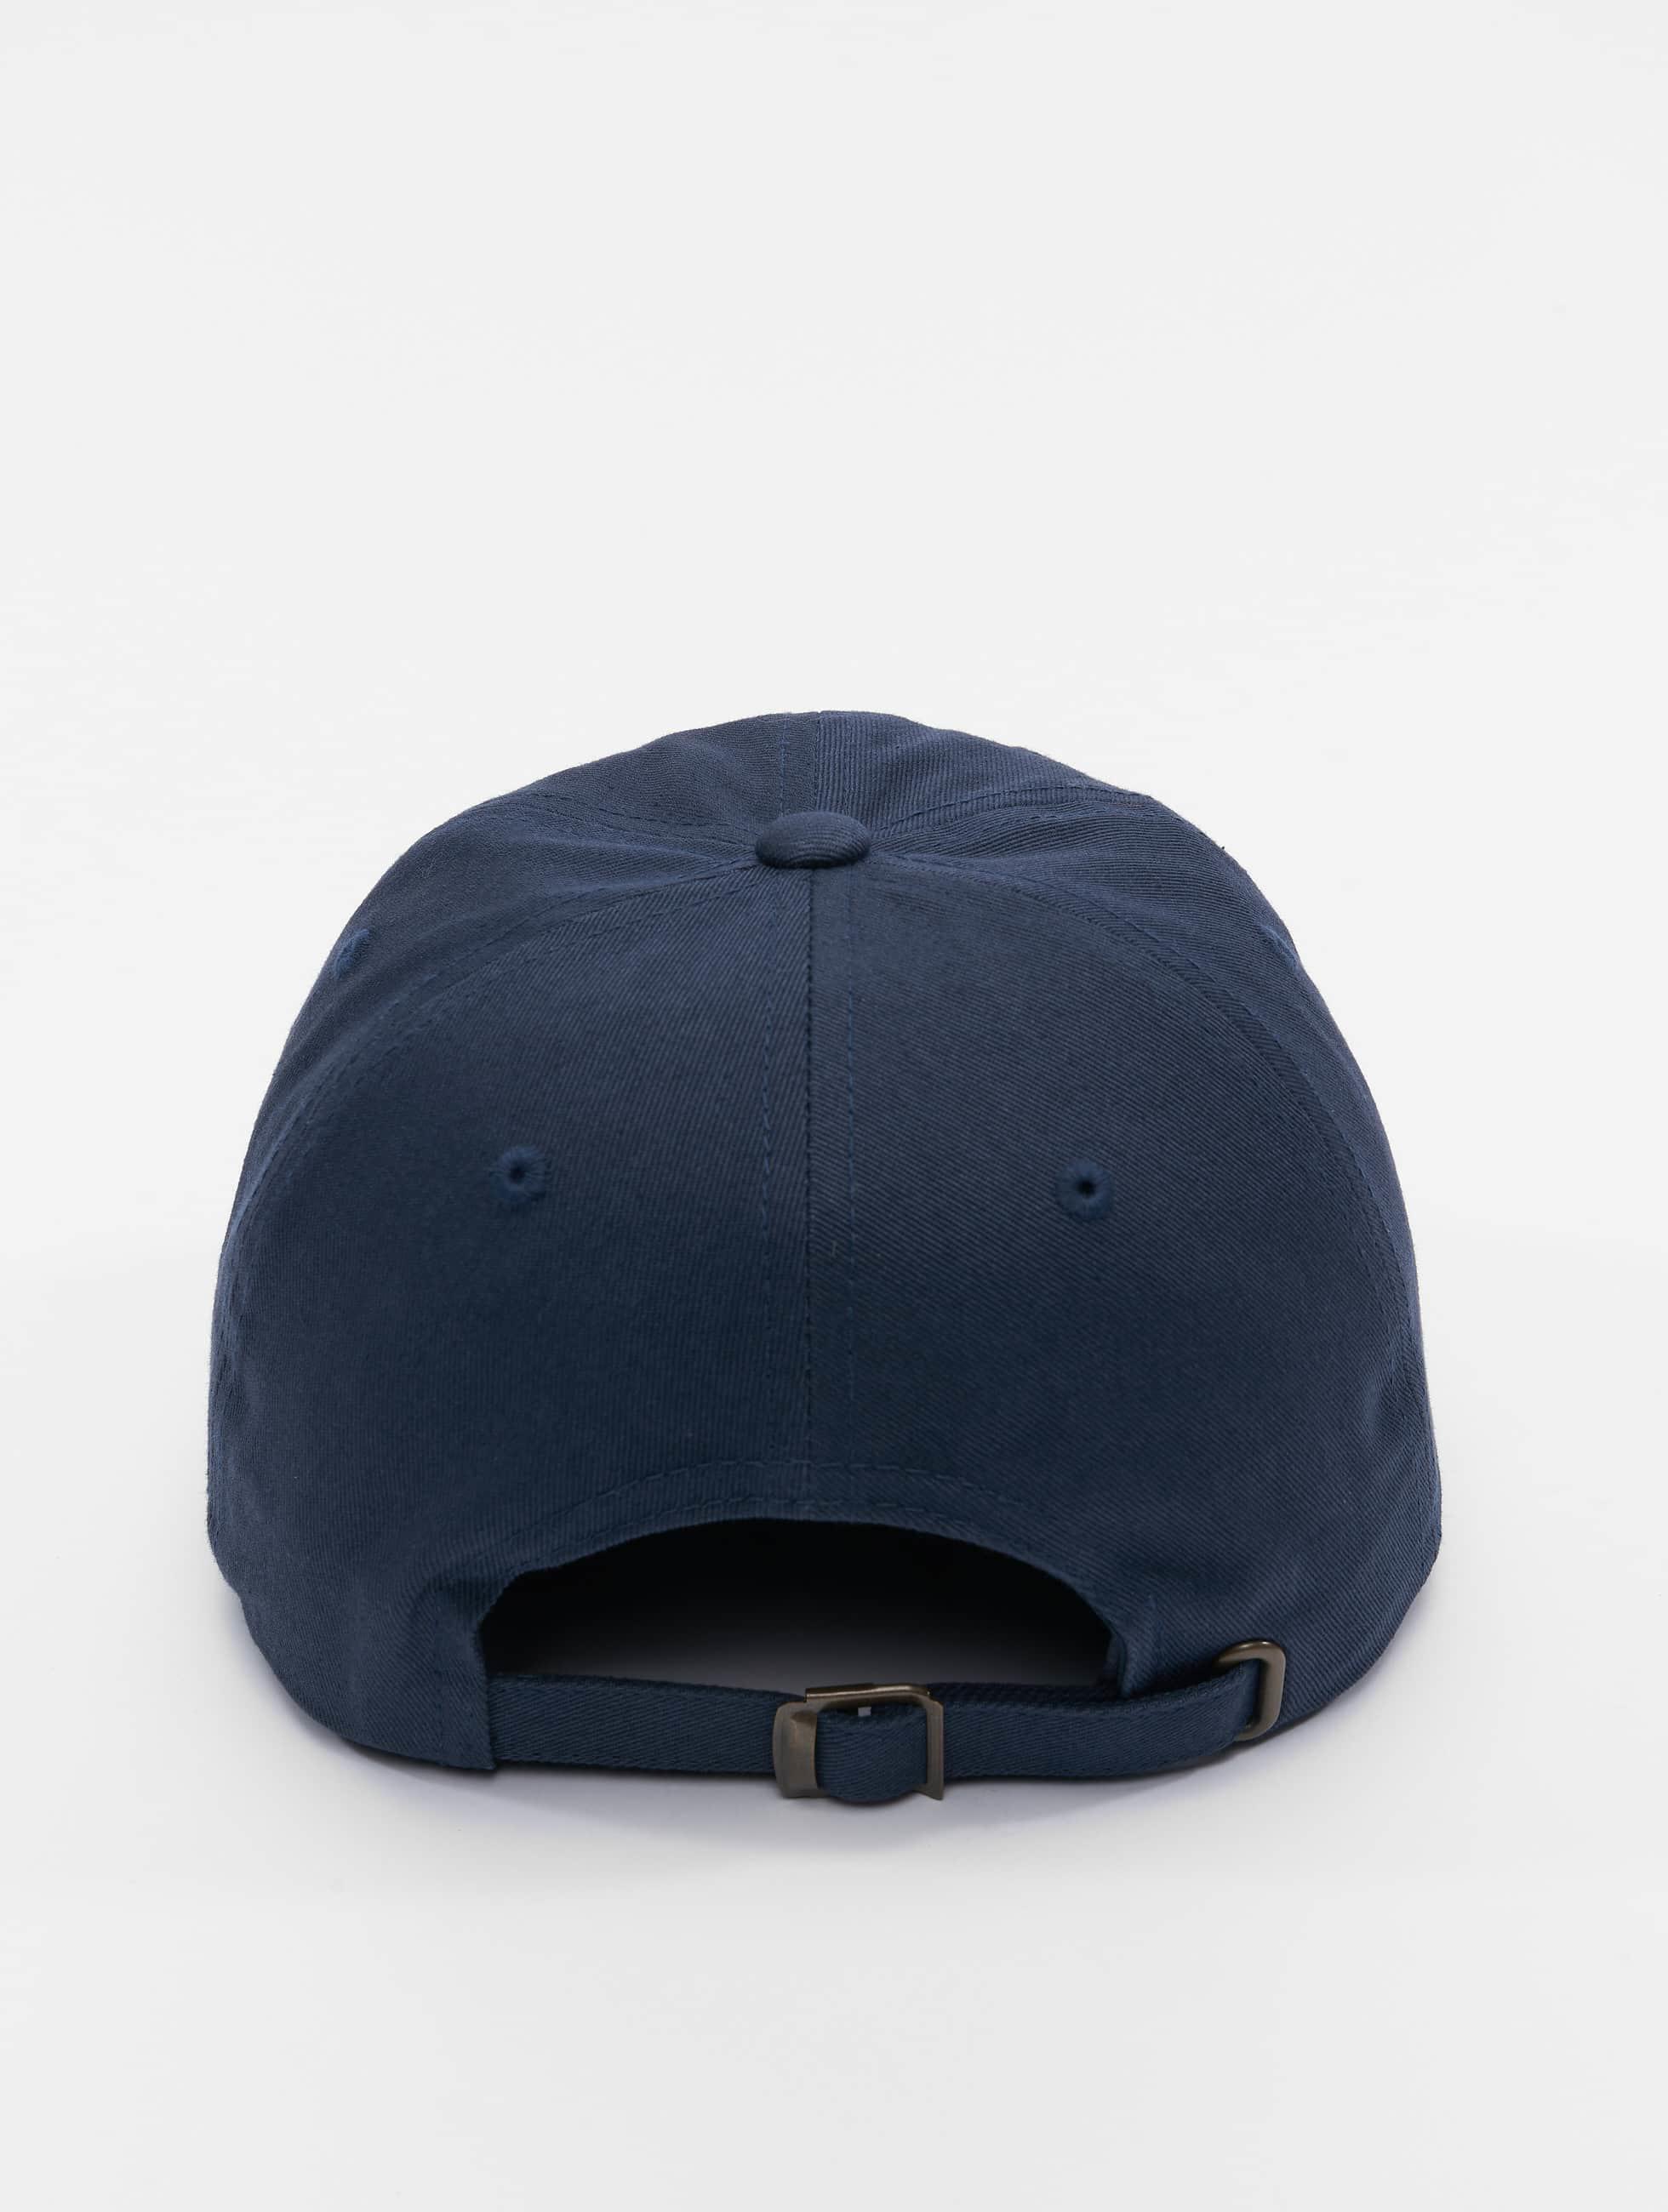 TurnUP Casquette Snapback & Strapback Brrr bleu